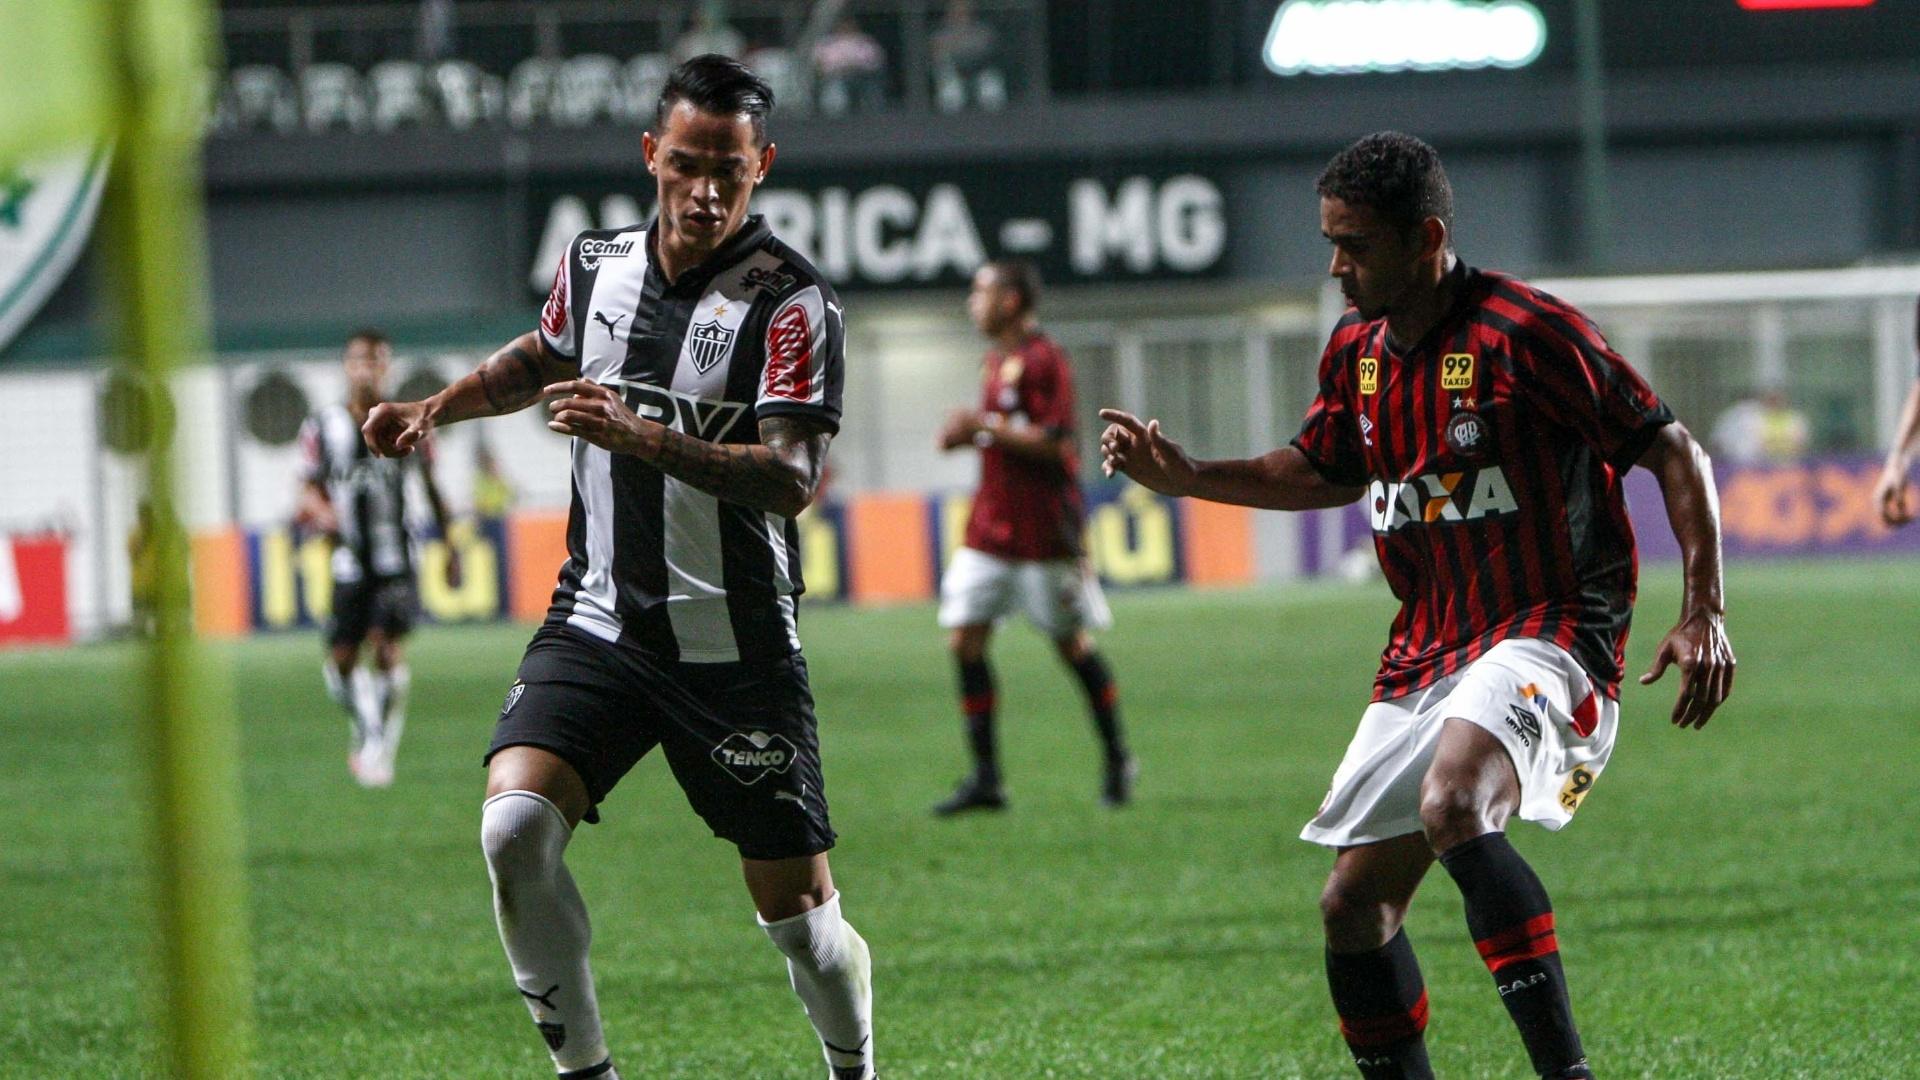 Giovanni Augusto tenta jogada contra o Atlético-PR